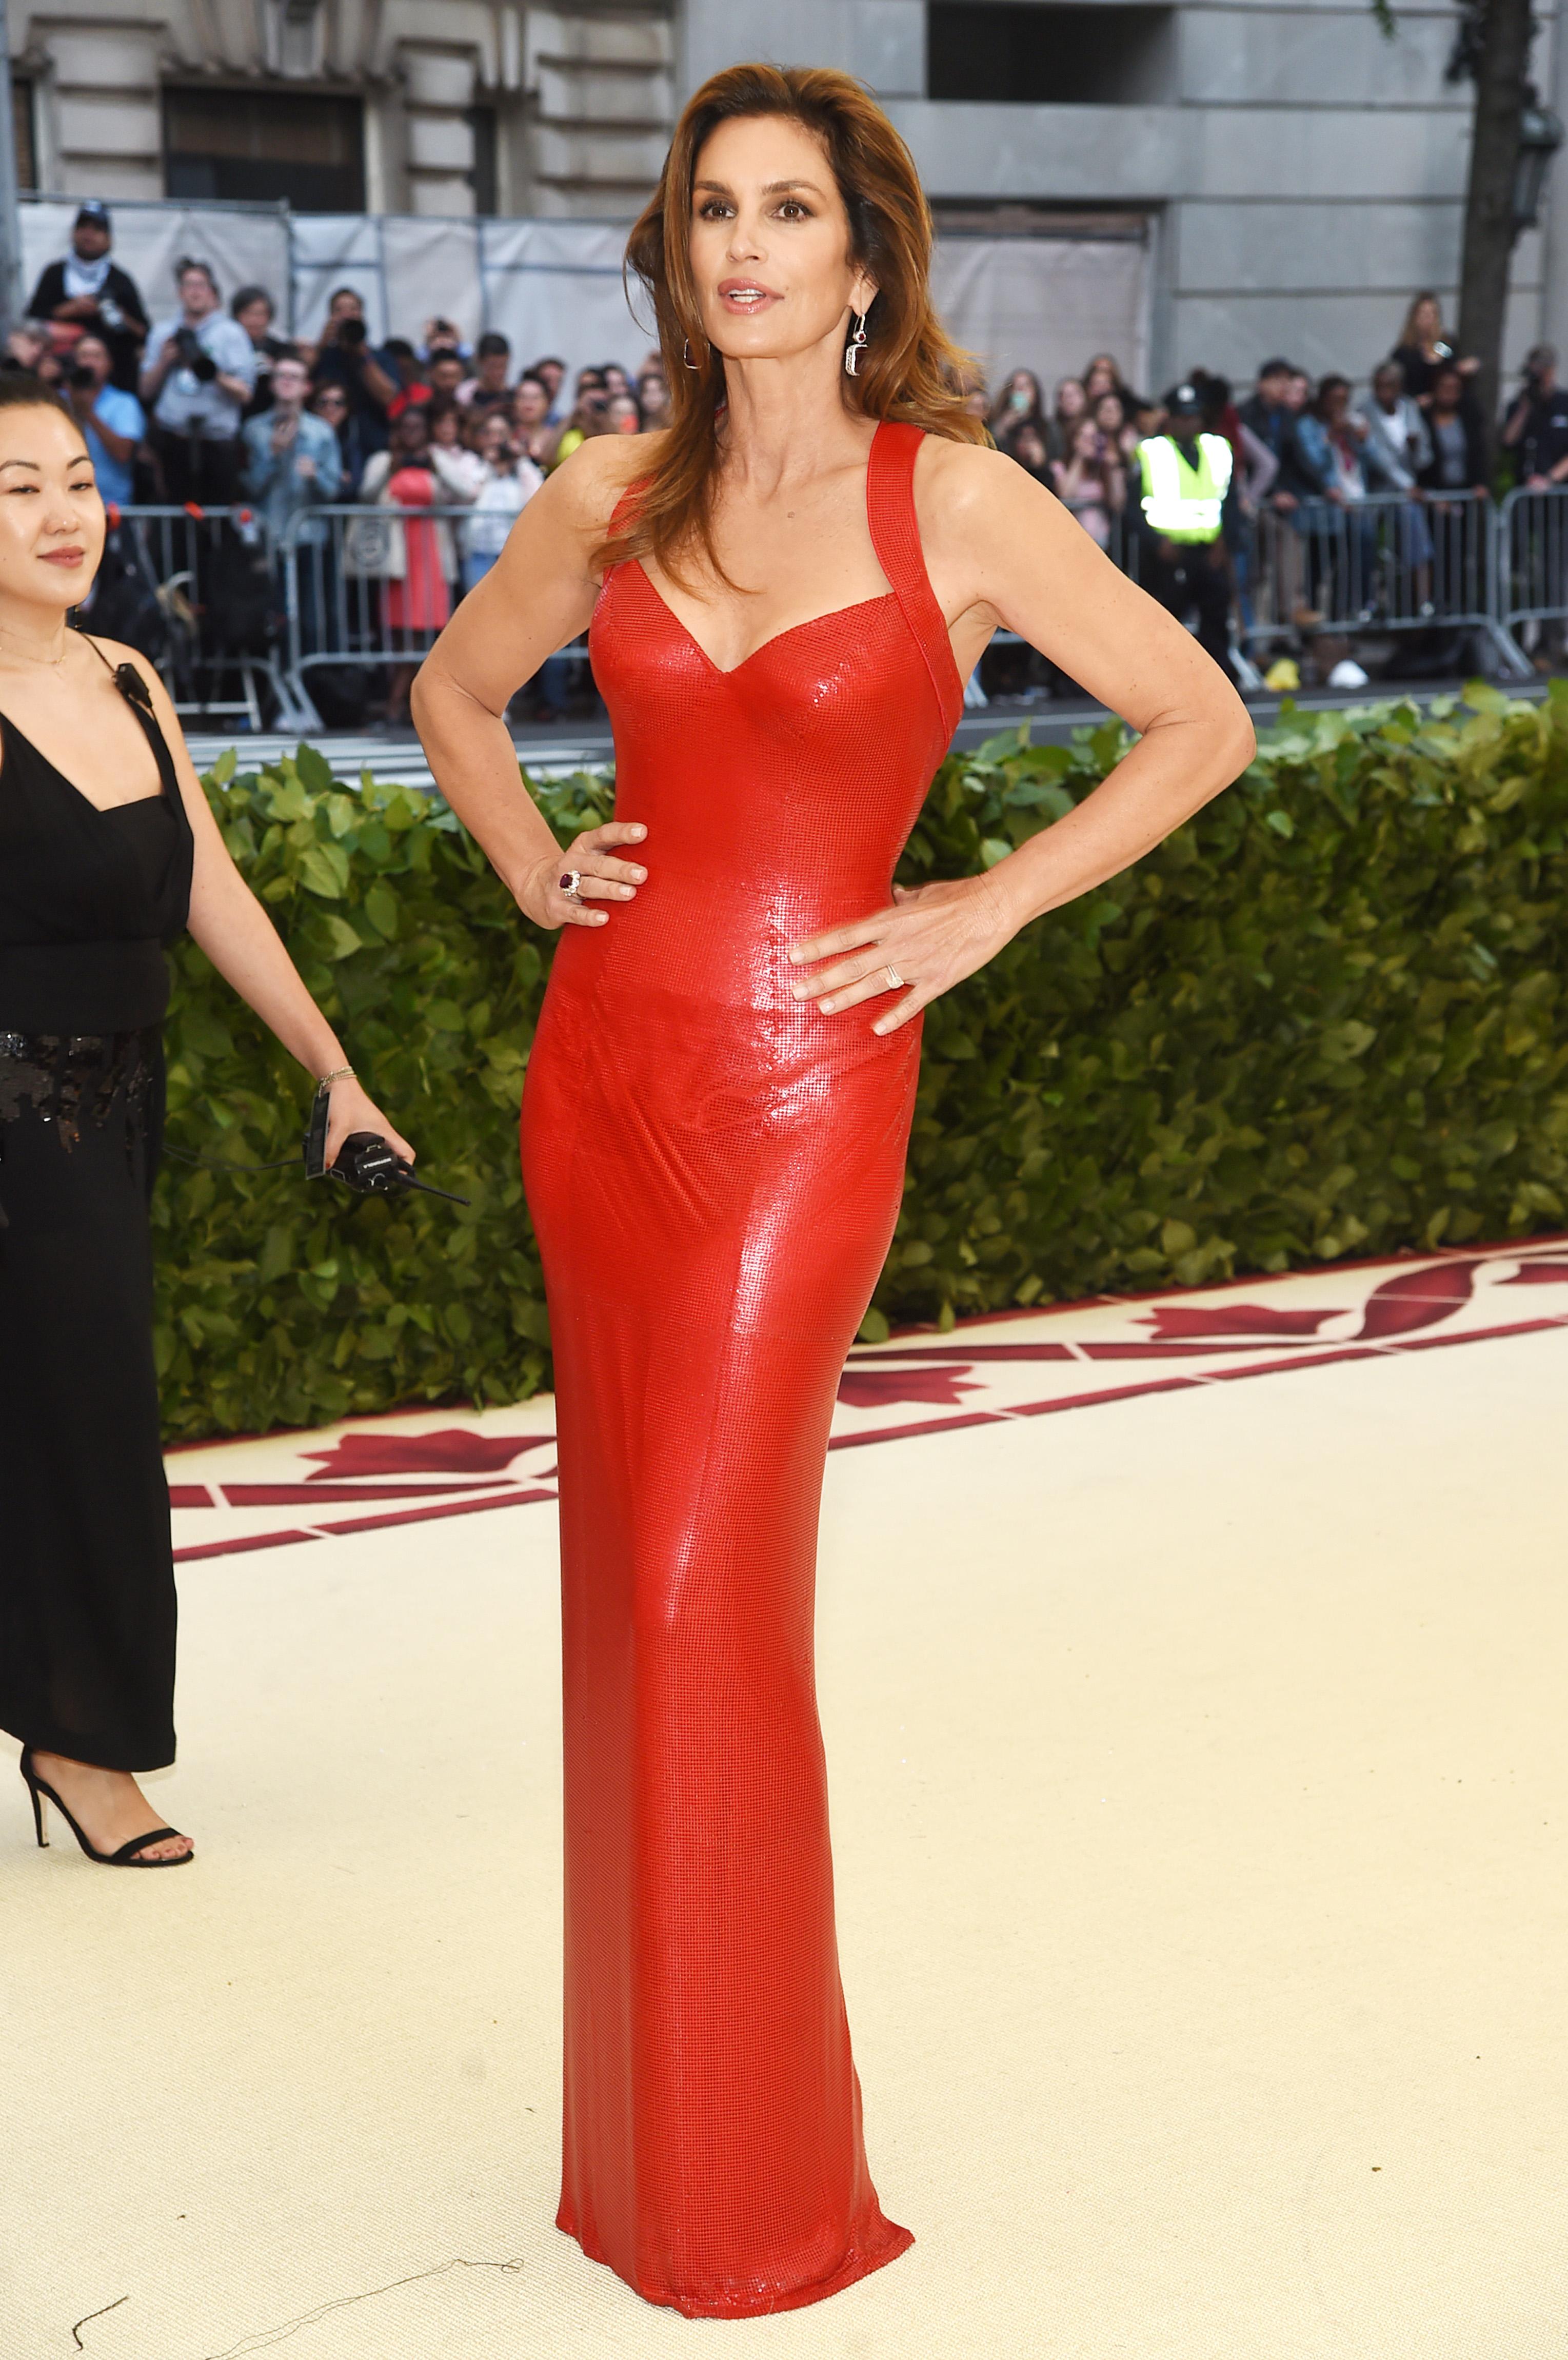 Met gala, famosas, alfombra roja, vestidos